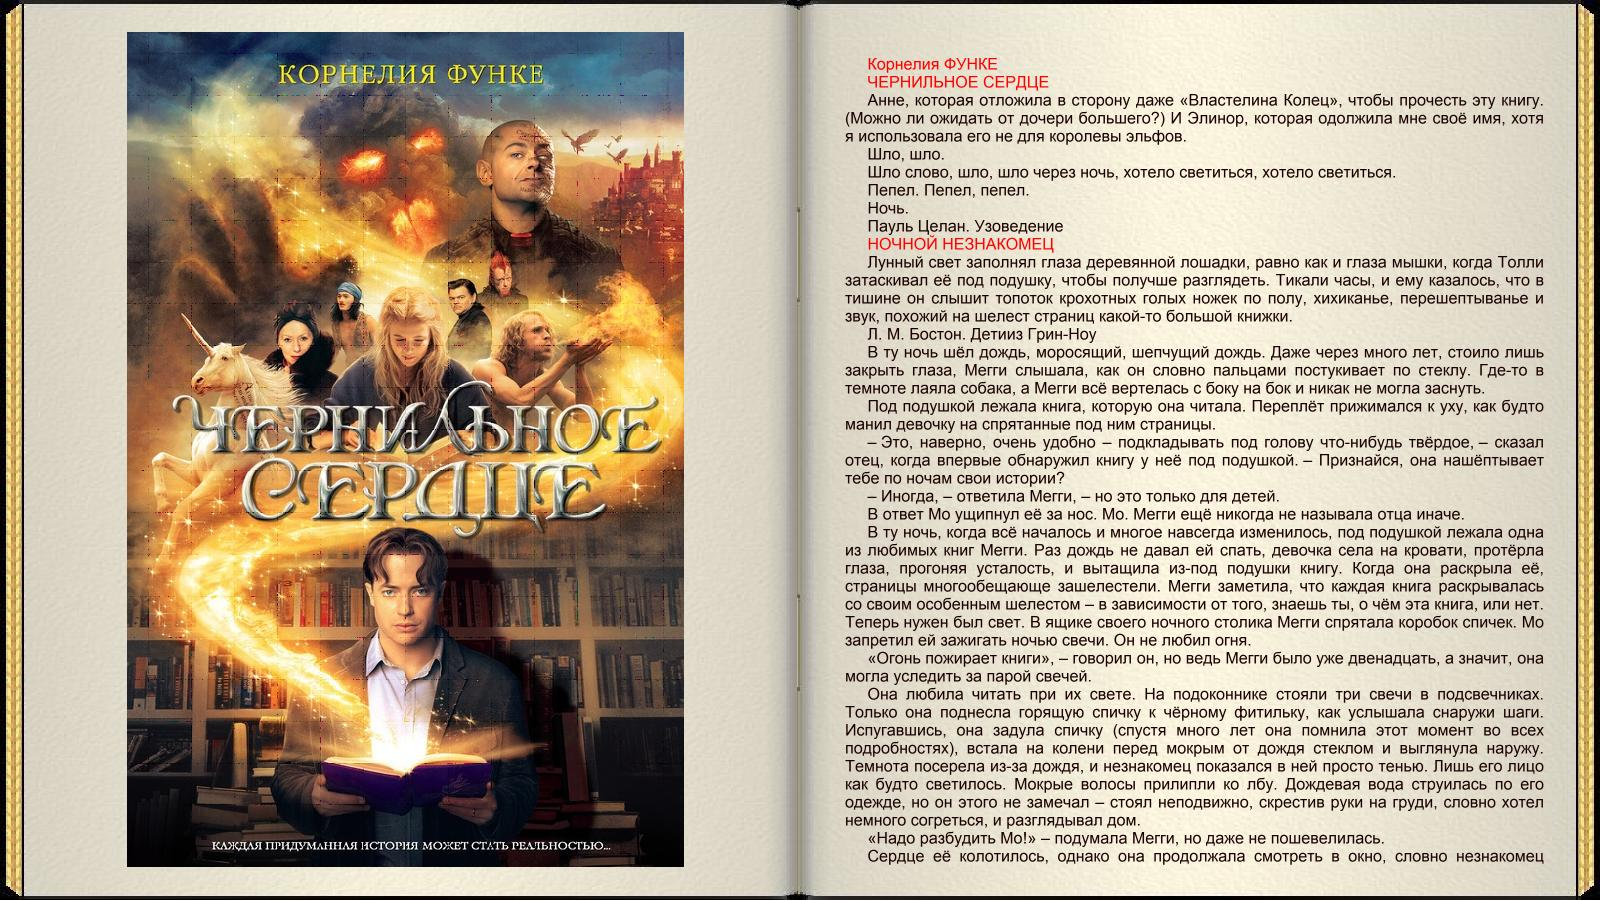 http://i4.imageban.ru/out/2016/02/01/6c05da86760609ca8b9f7563a39d4c79.jpg